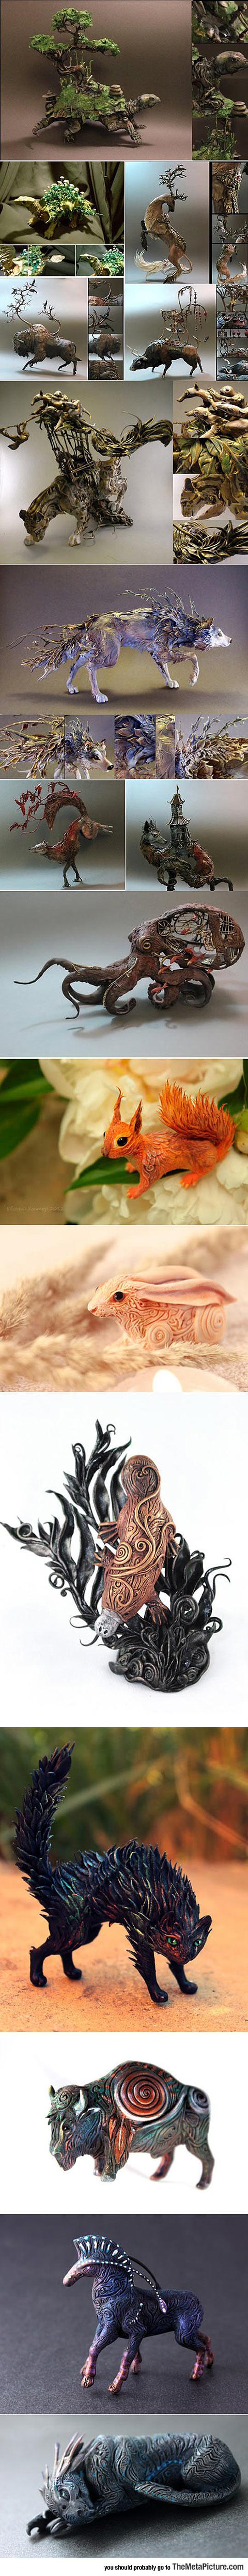 cool-animals-nature-tree-sculptures